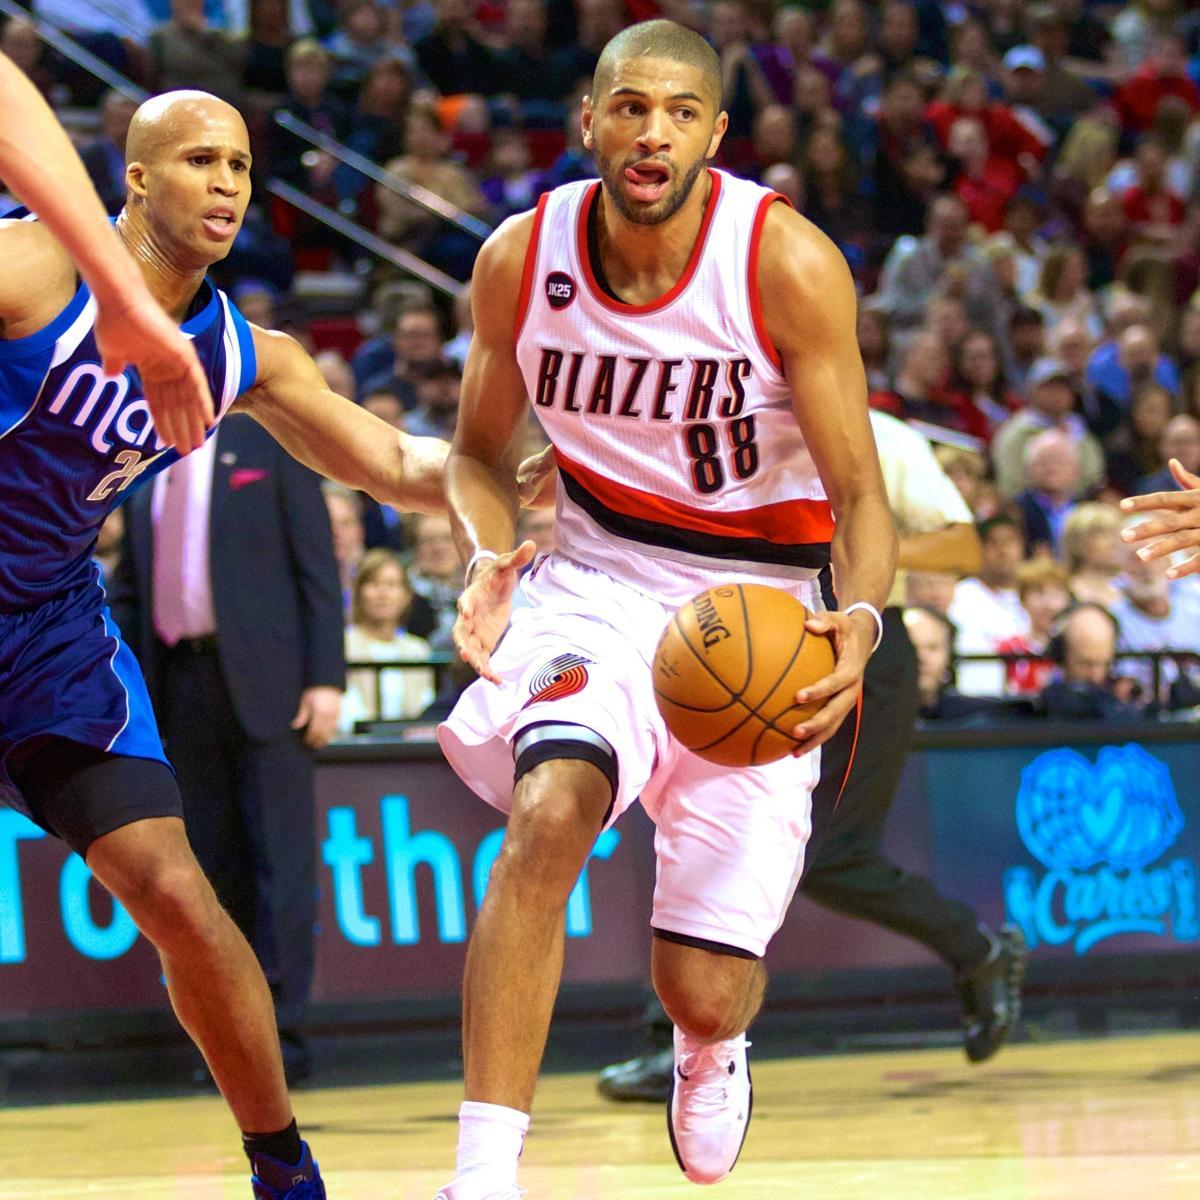 Blazers Score: Dallas Mavericks Vs. Portland Trail Blazers: Live Score